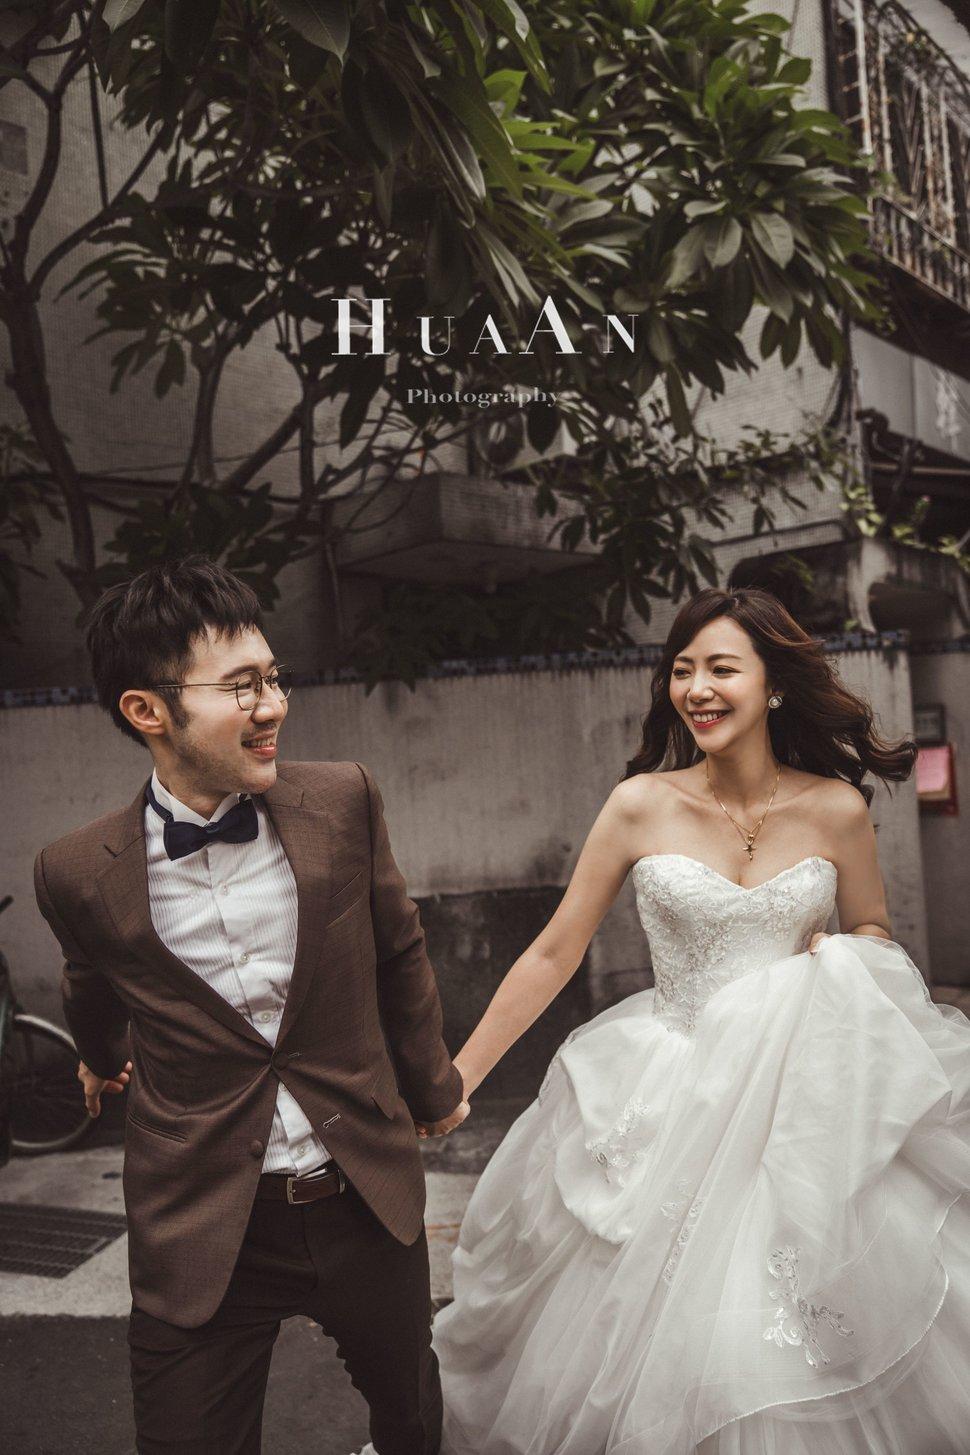 HUA00831 - Huaan Photography《結婚吧》